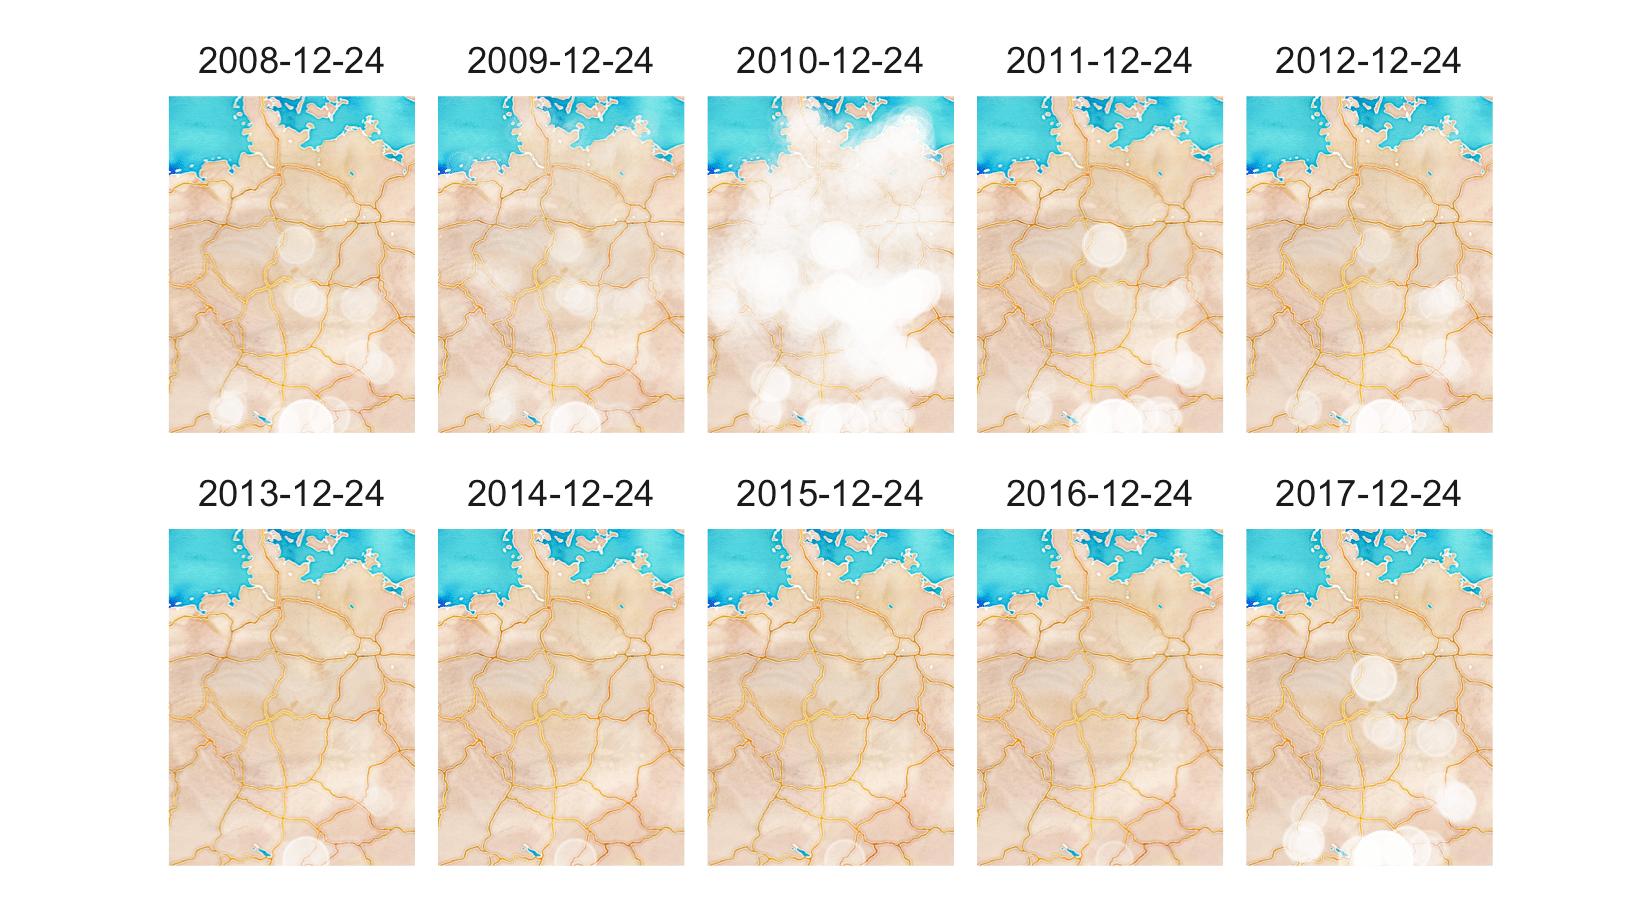 Snow depth on Christmas Eve per year (2008-2017)